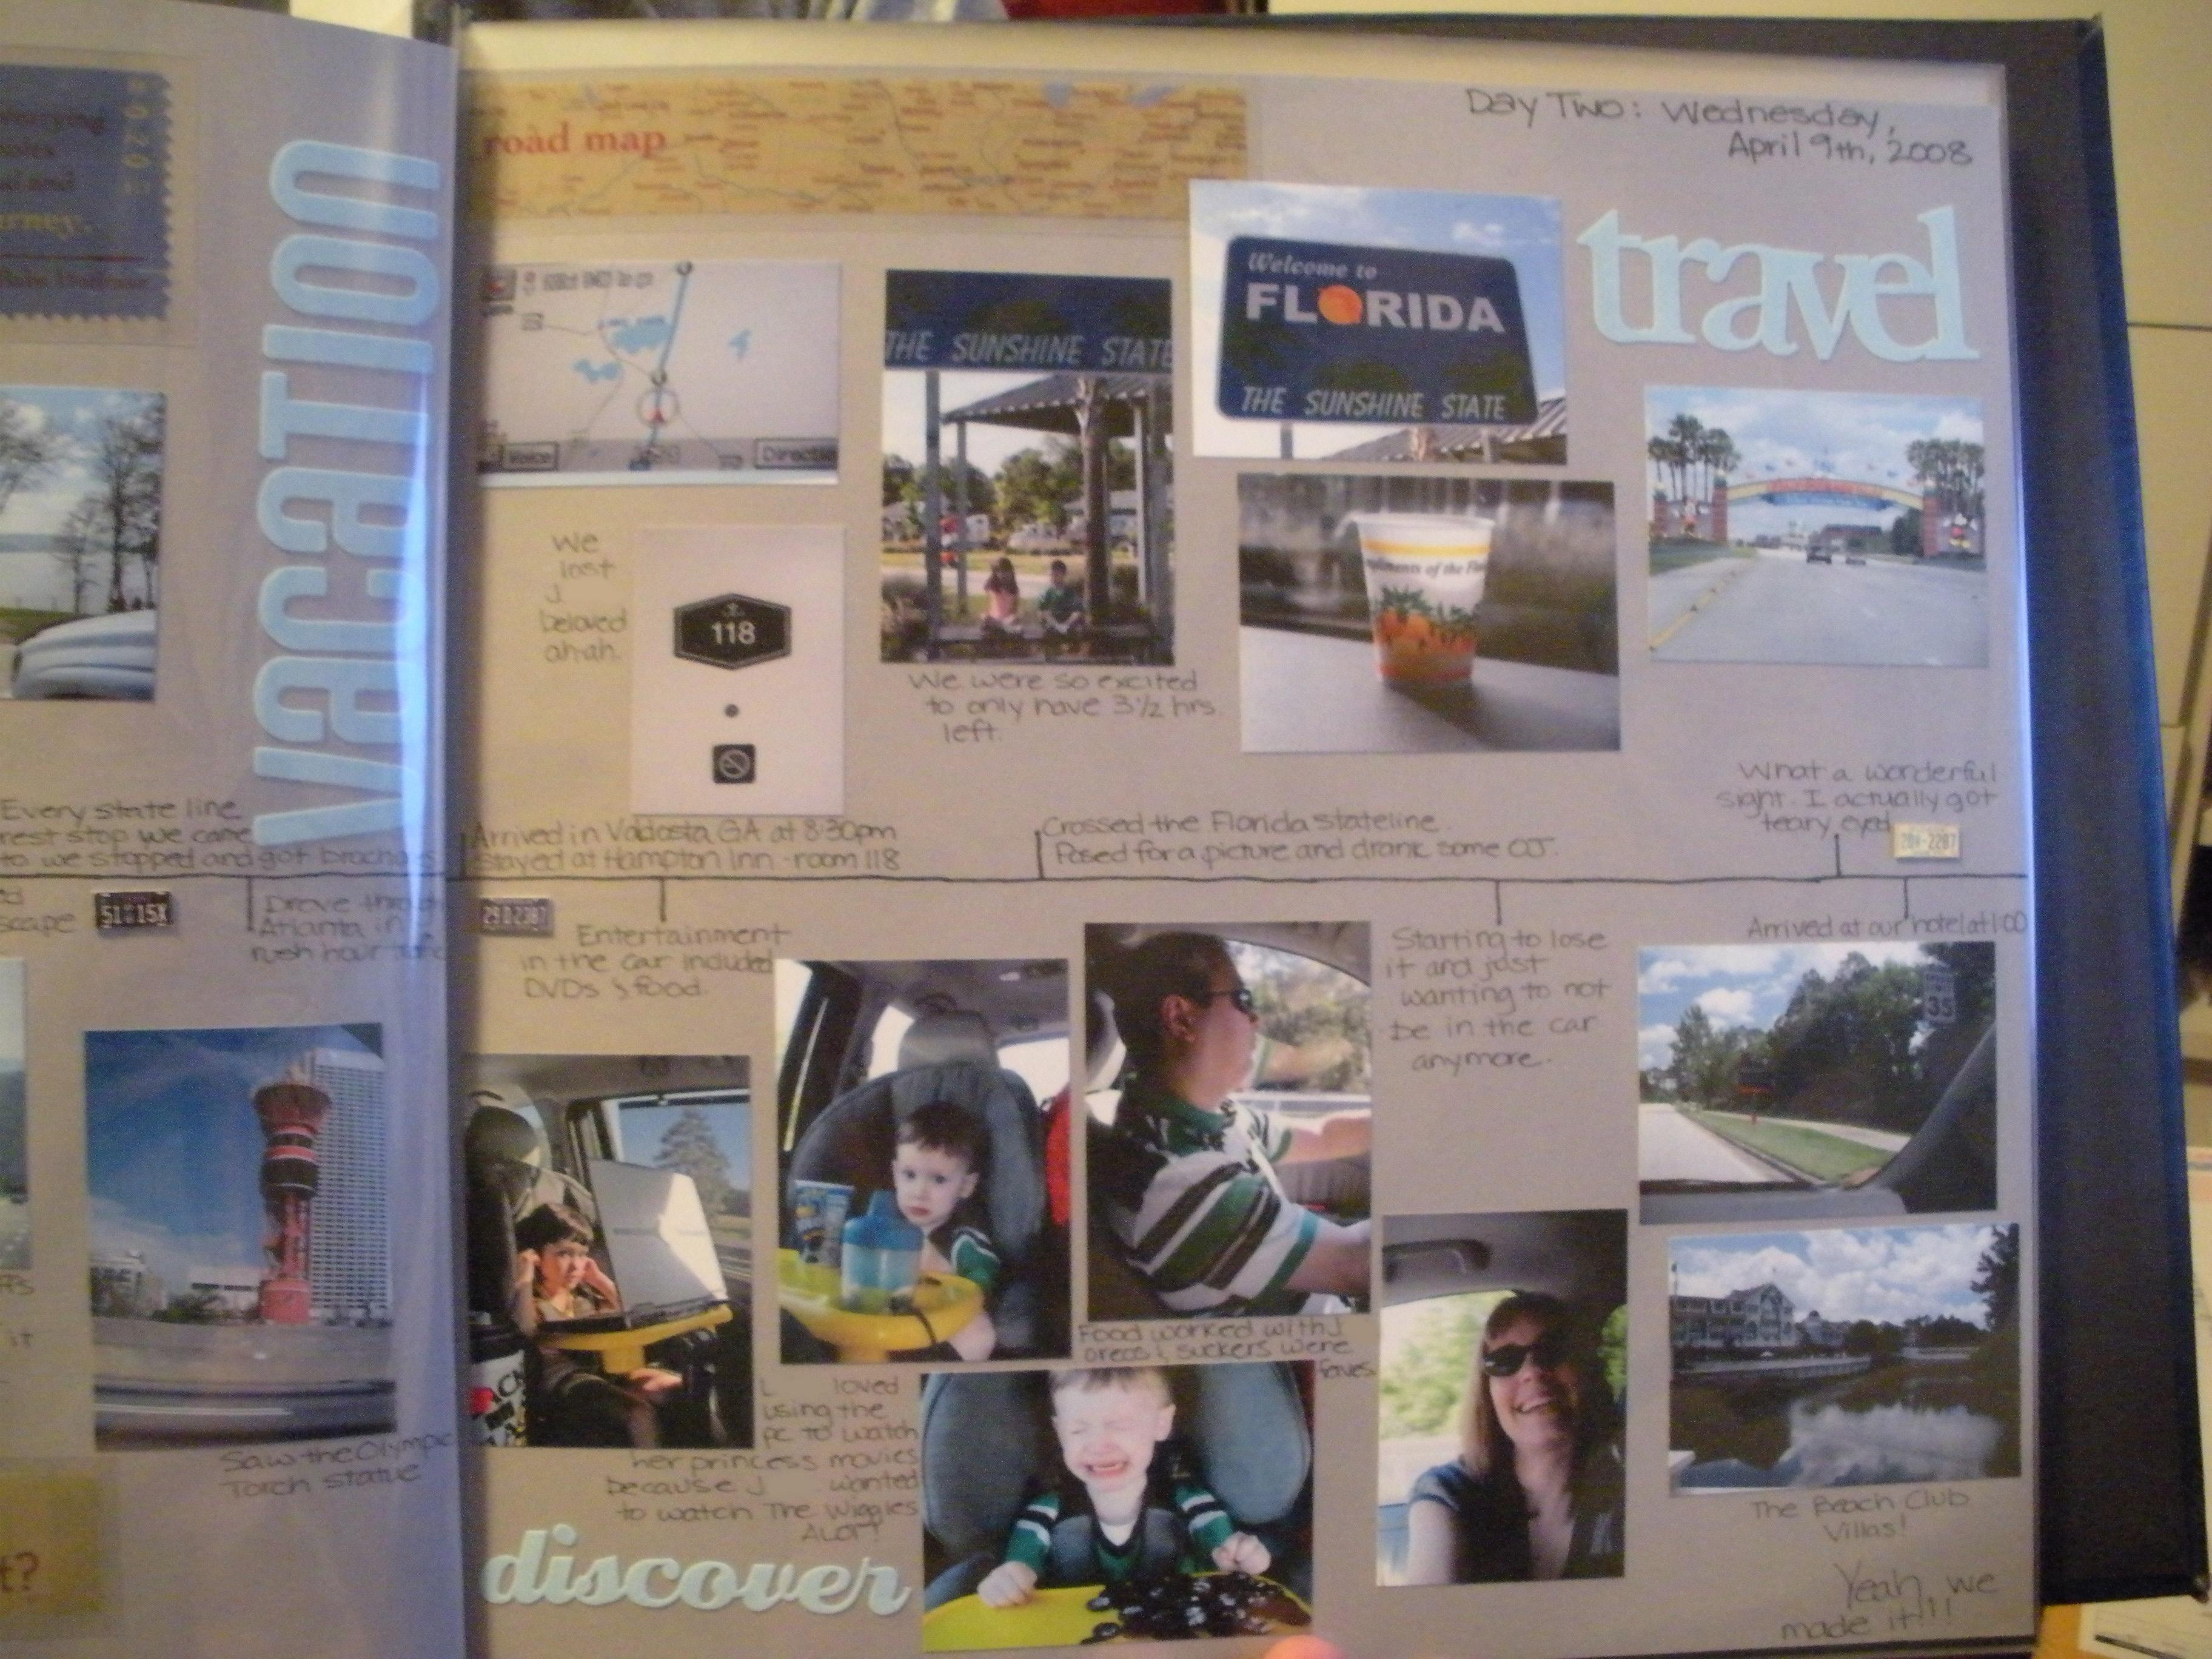 How to scrapbook a road trip - Dscn4337 2 Jpg